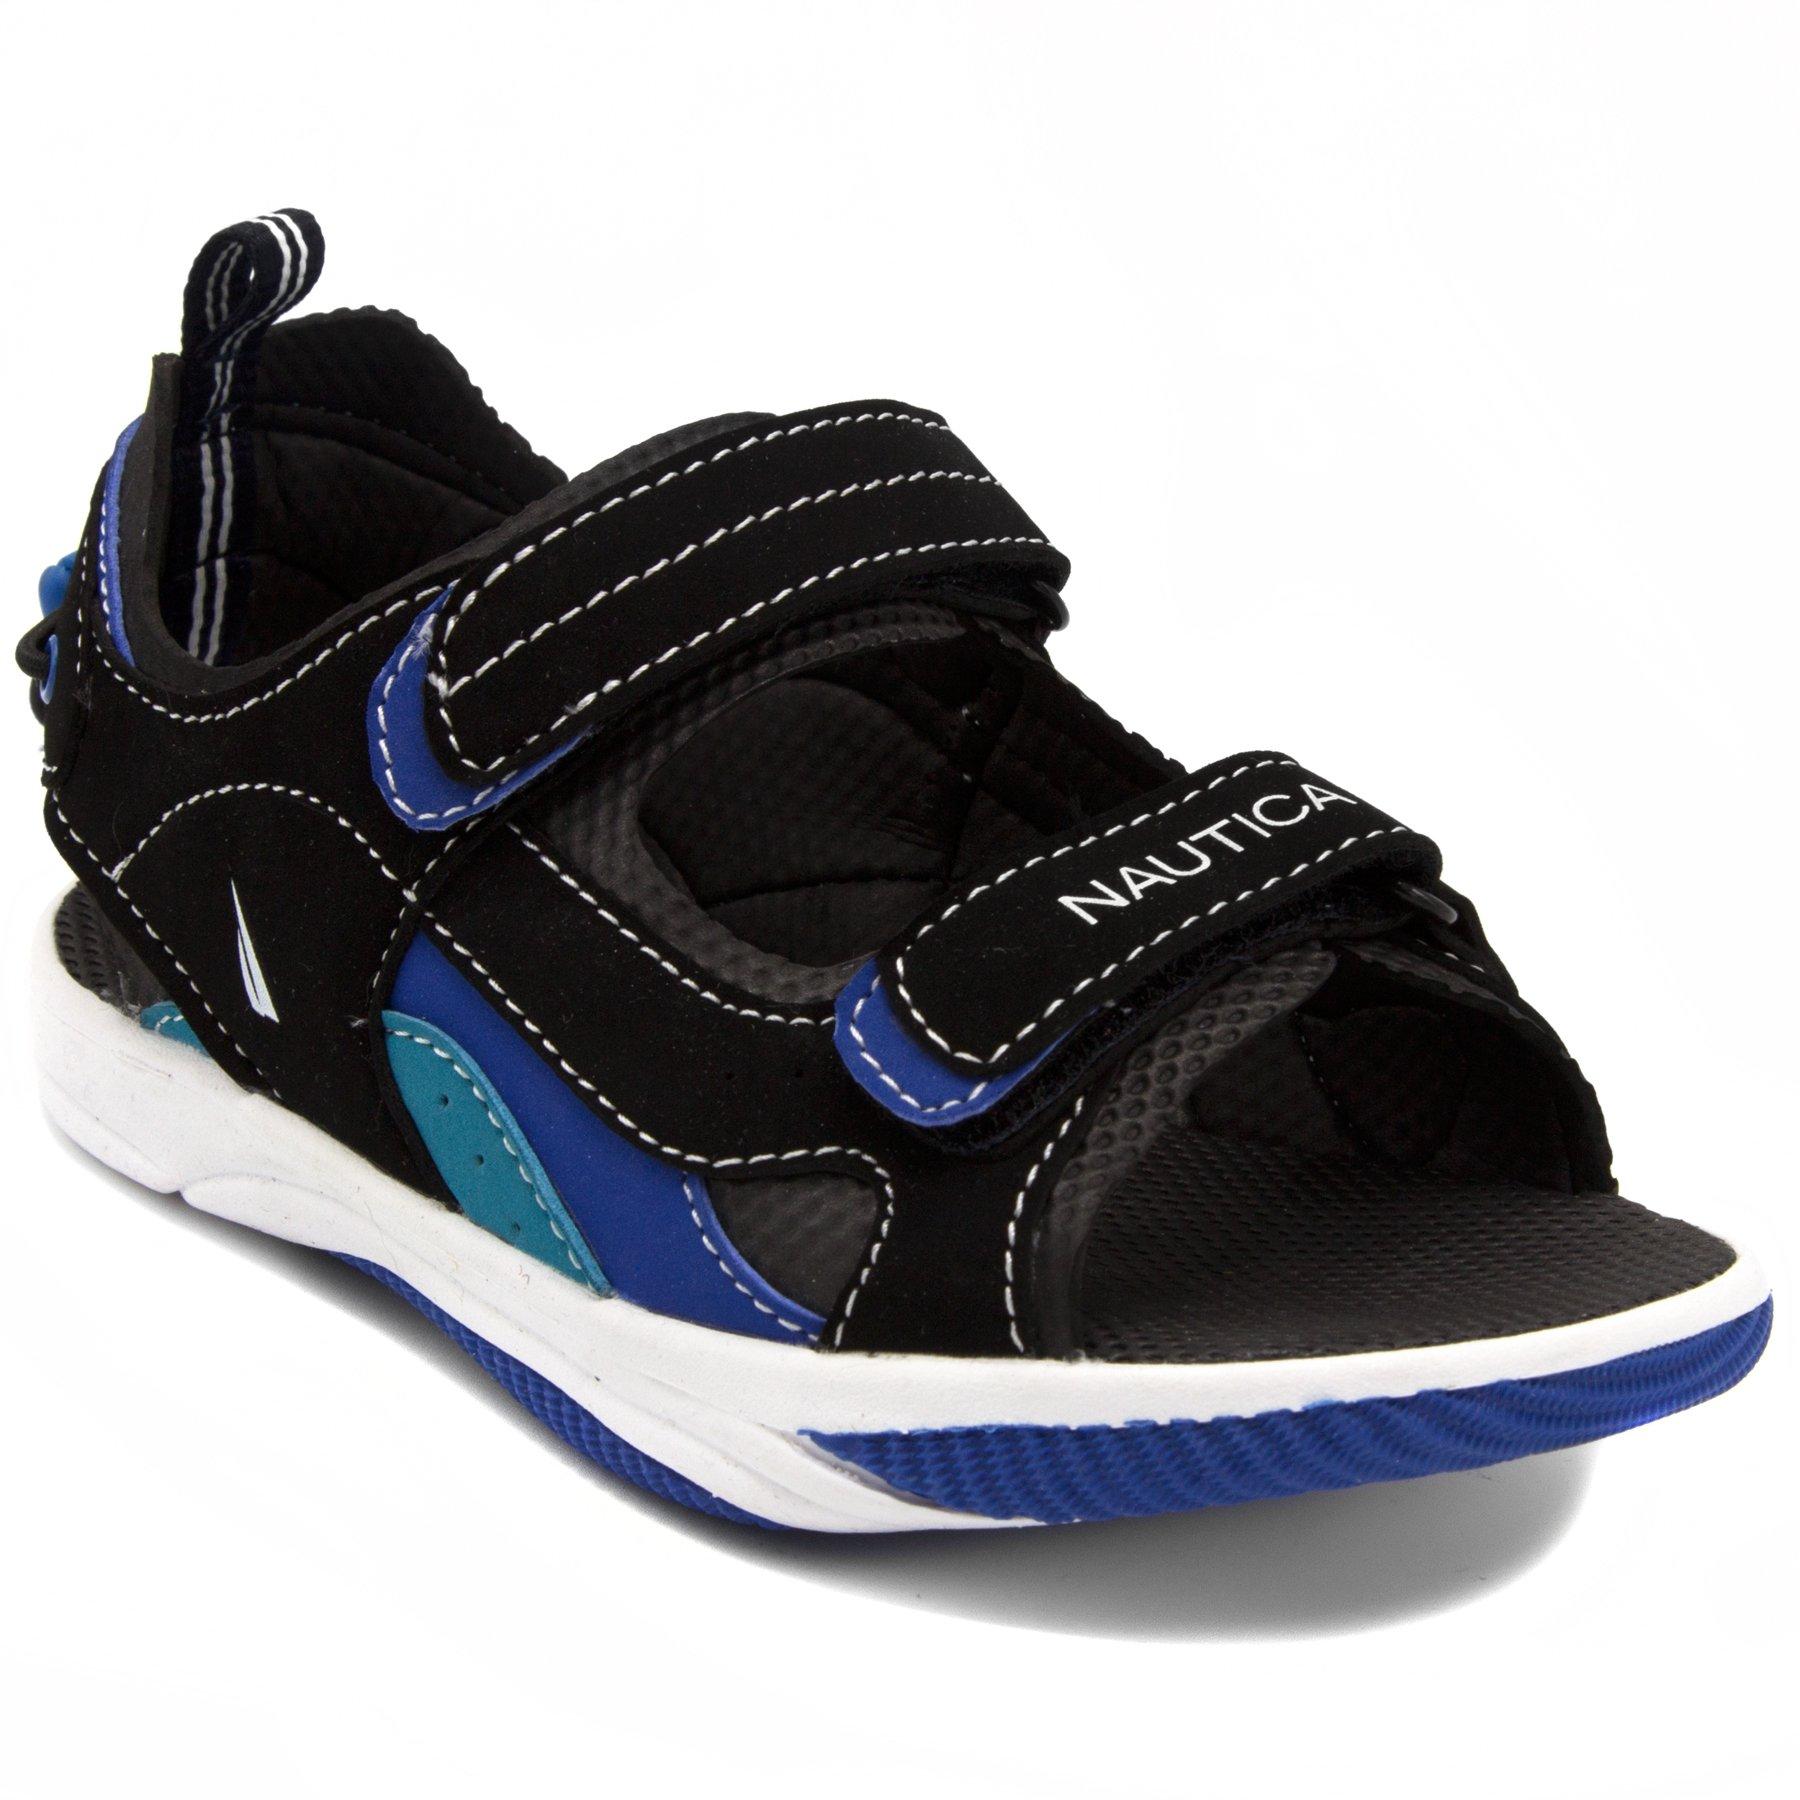 Nautica Kids Jamestown Sports Sandals, Open Toe Athletic Beach Water Shoes-Black/Blue/Teal-1